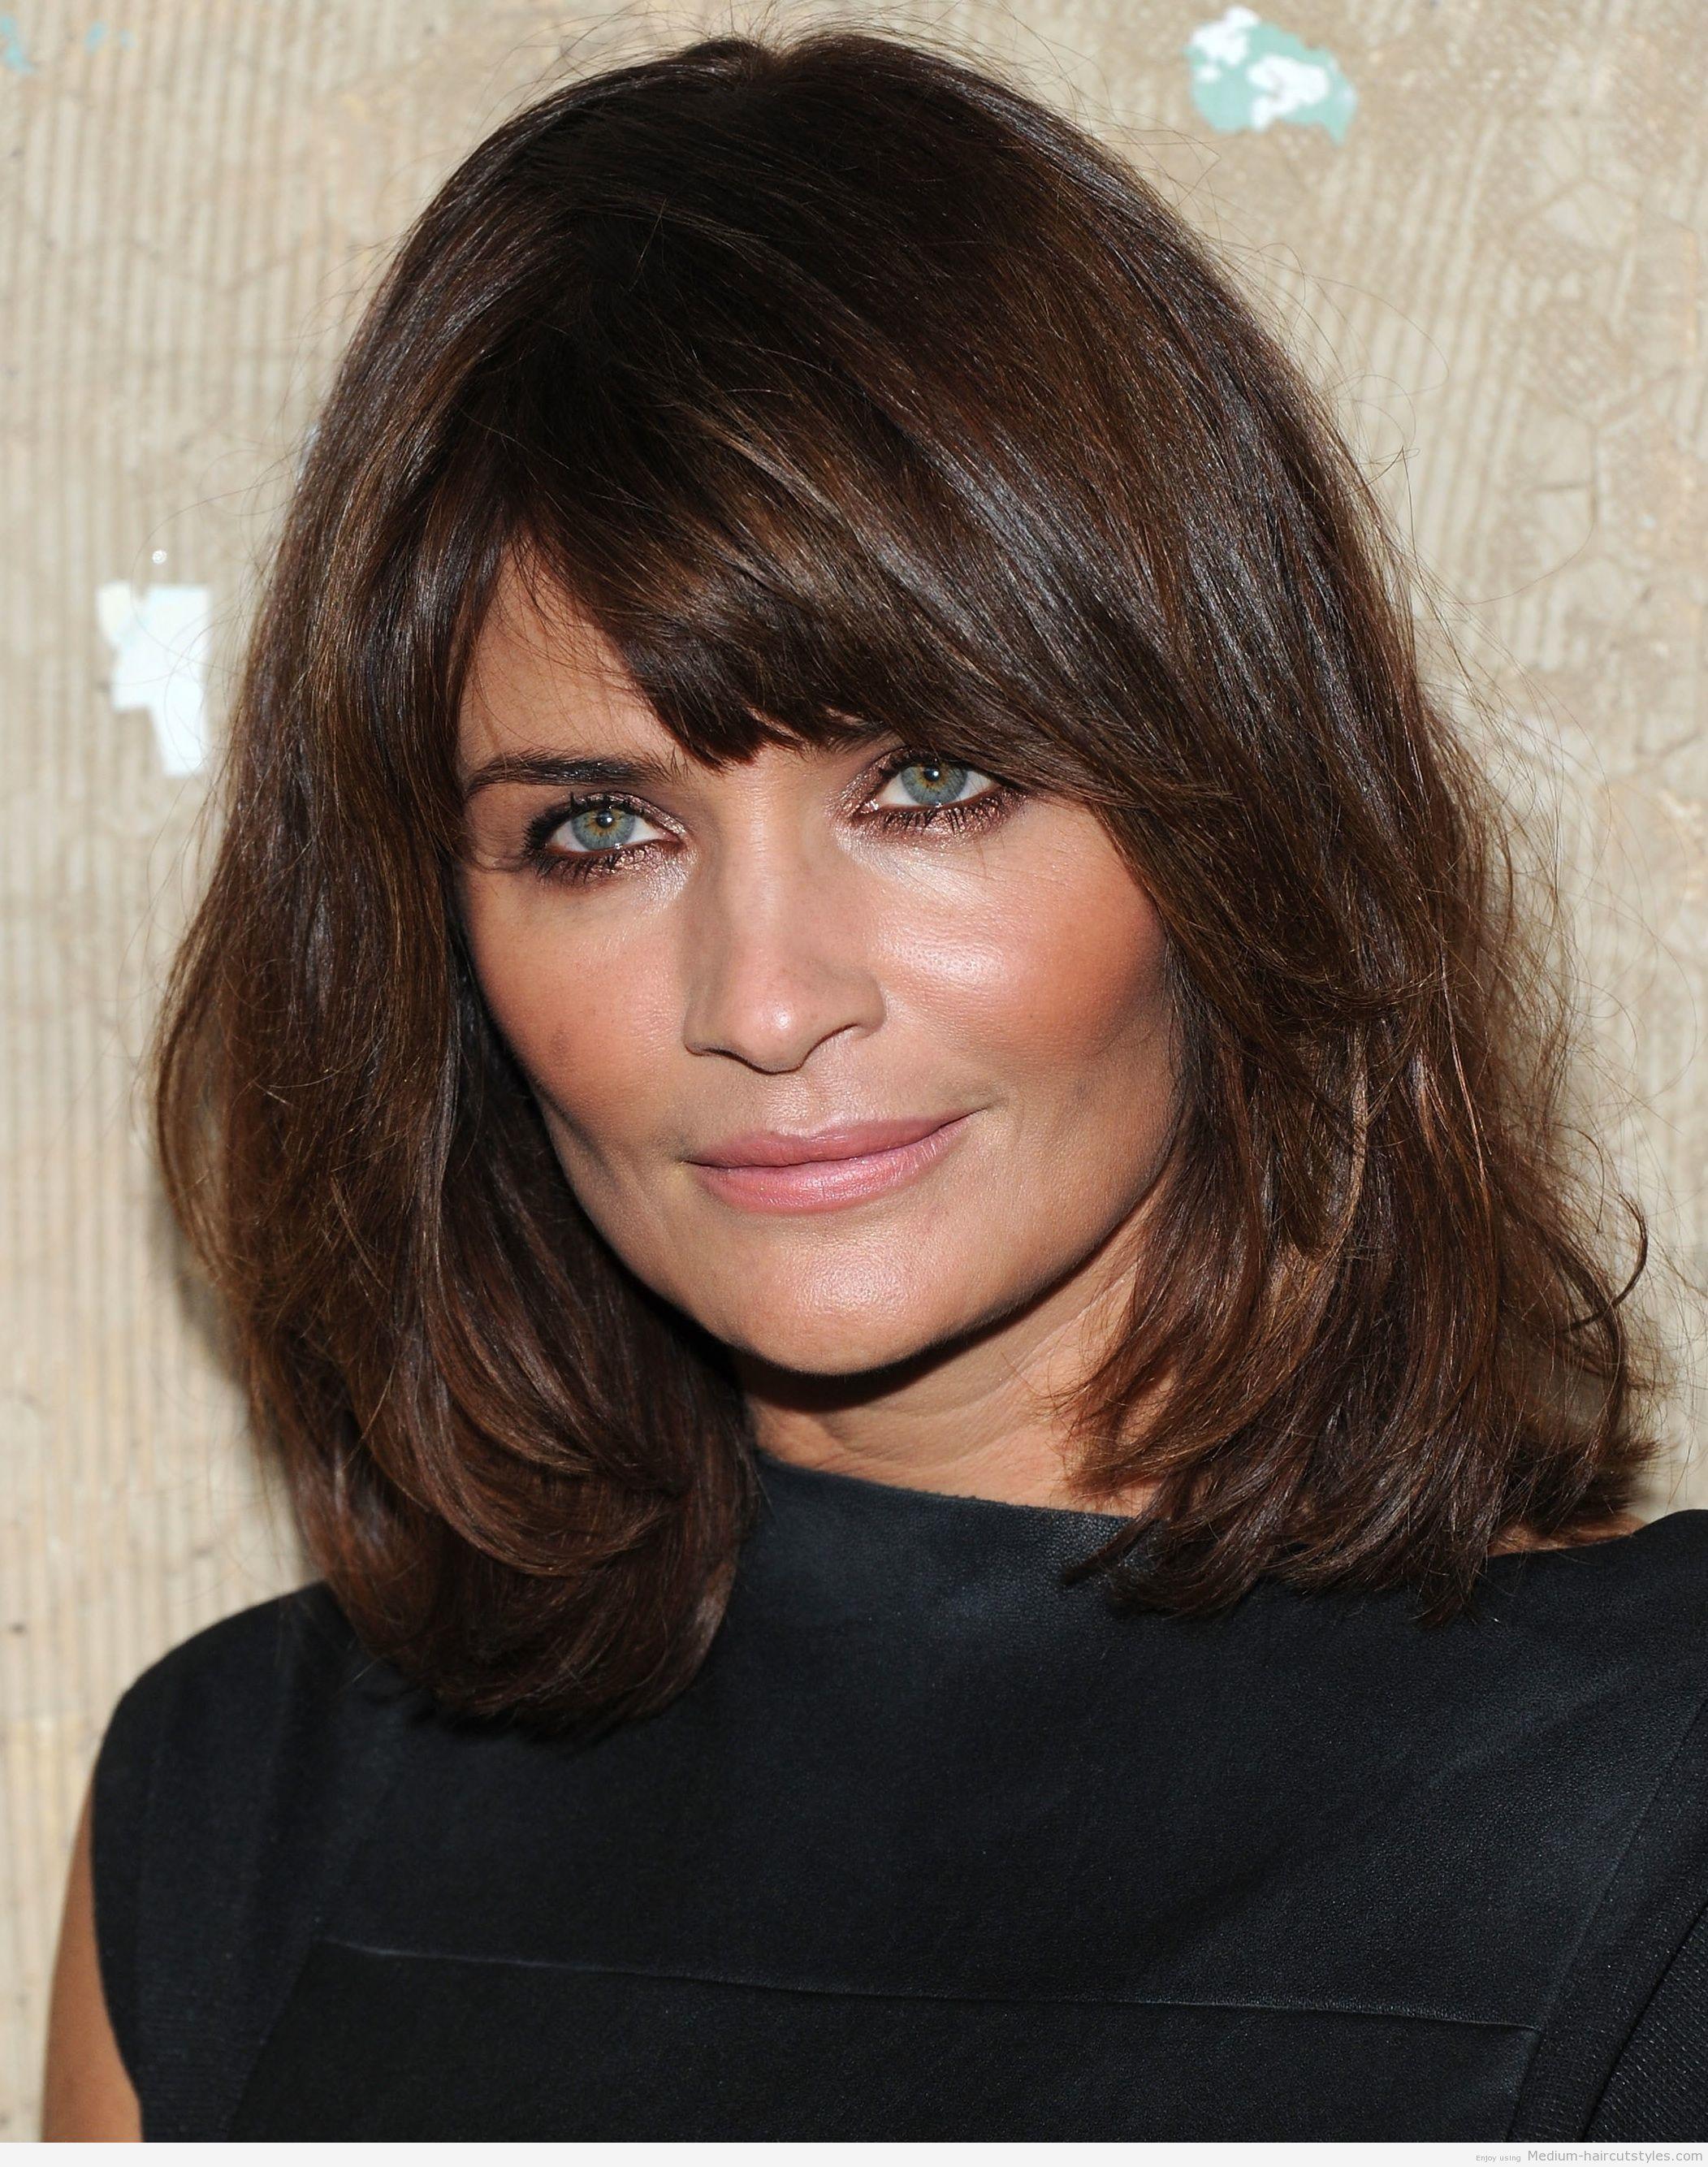 medium short hairstyles 2014 women is the best hairstyle